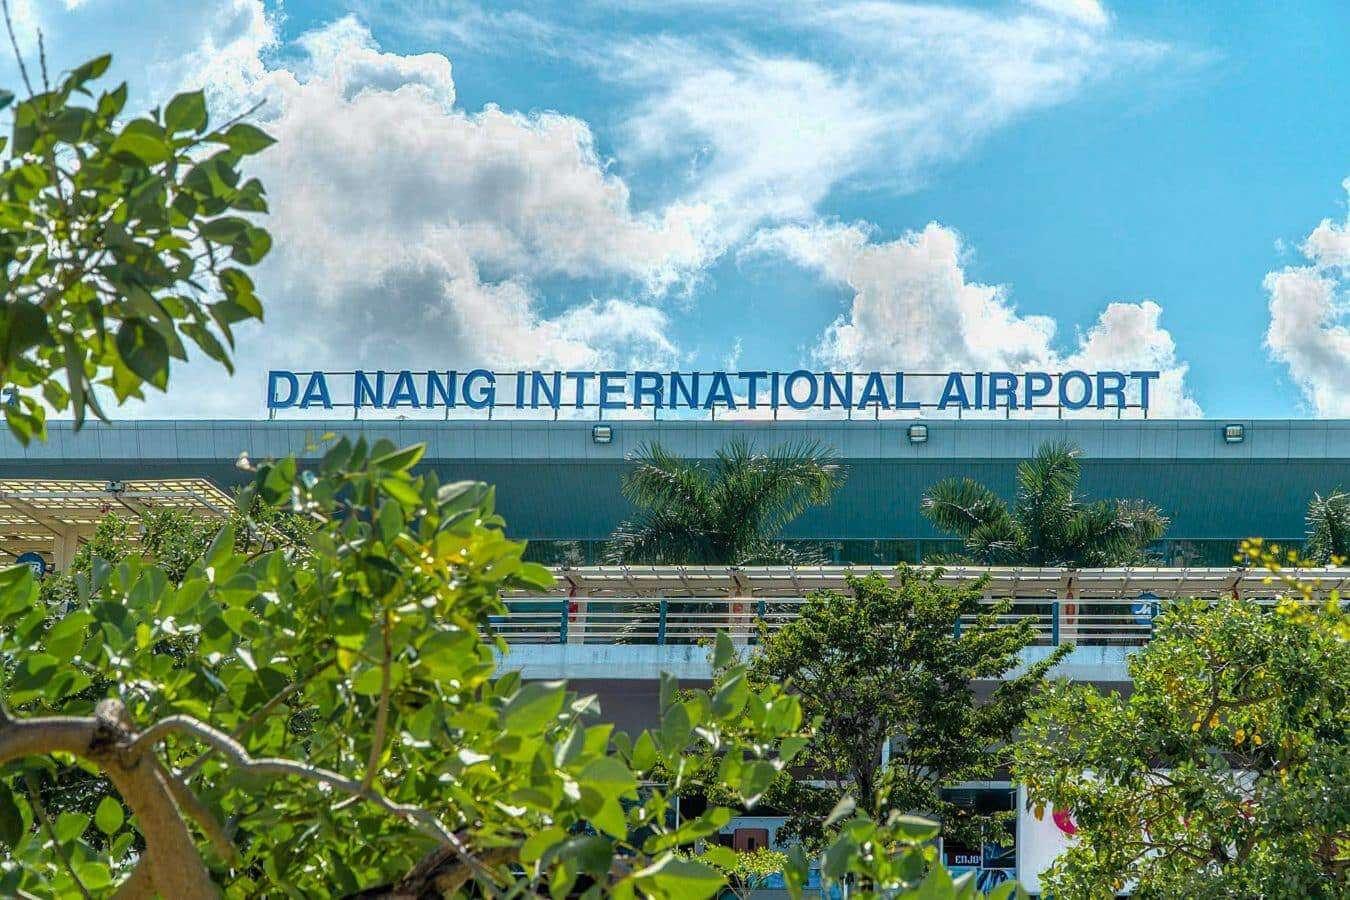 Exterior of Da Nang Airport - Da Nang to Hoi An